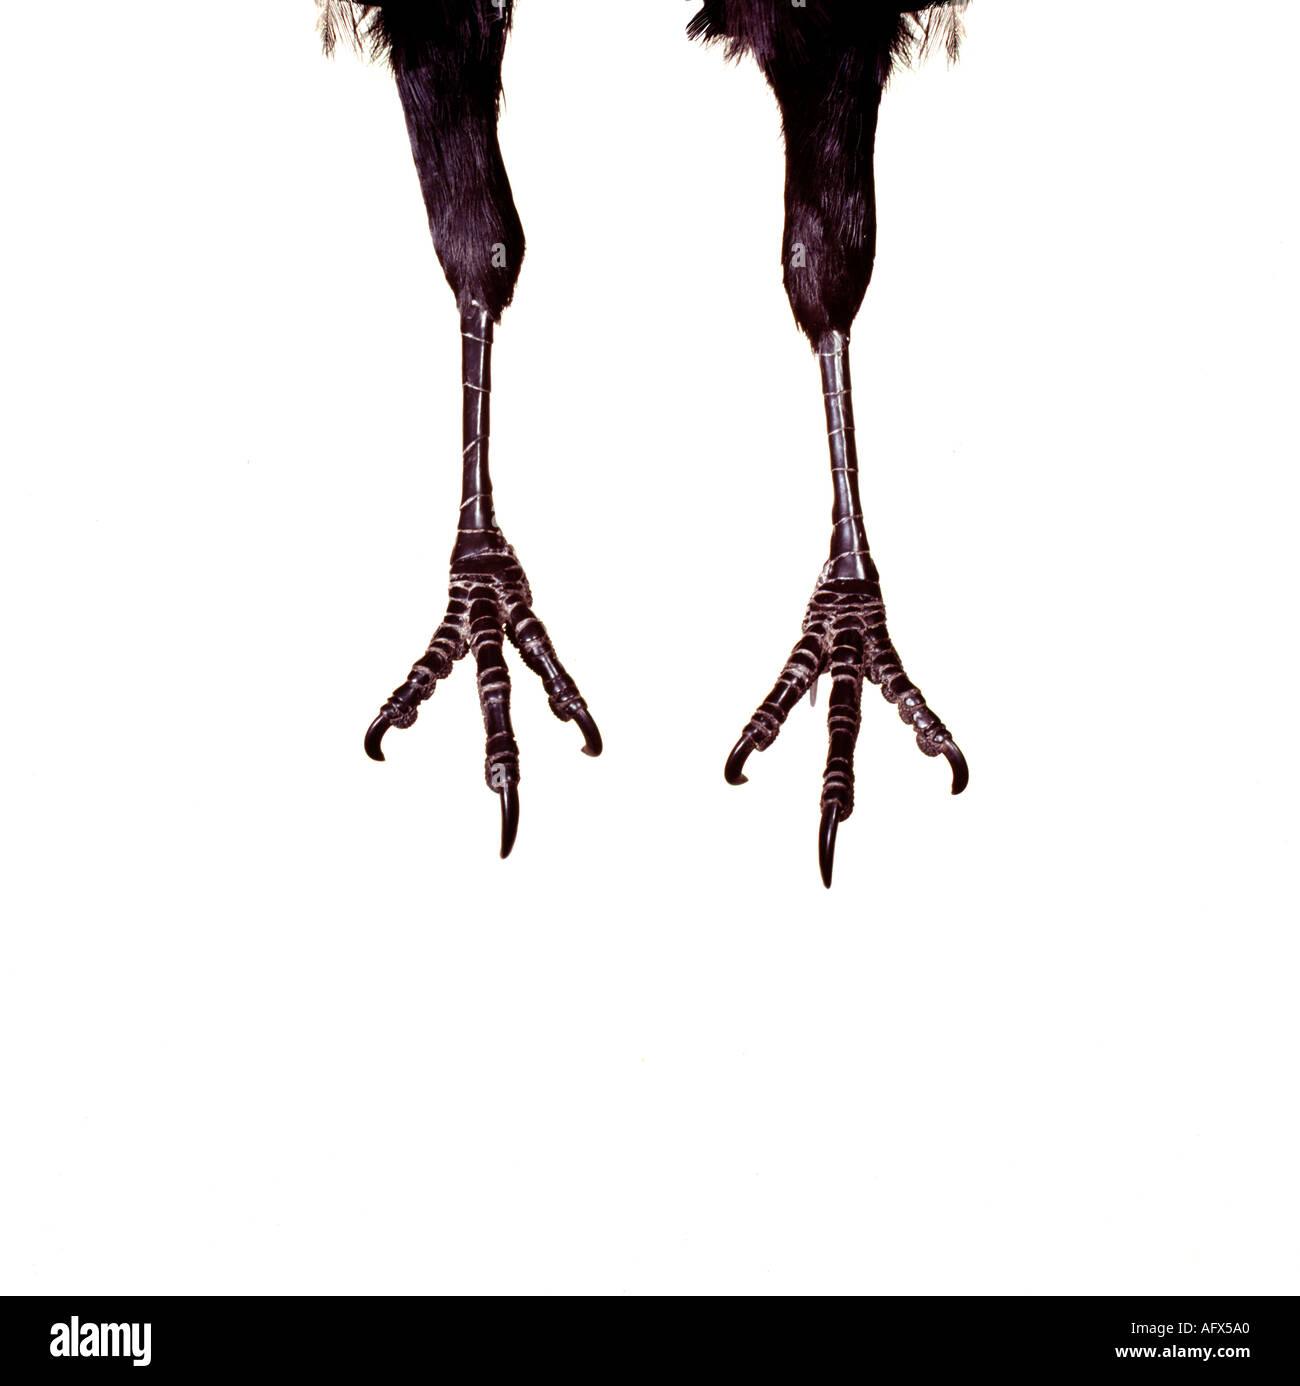 crows foot